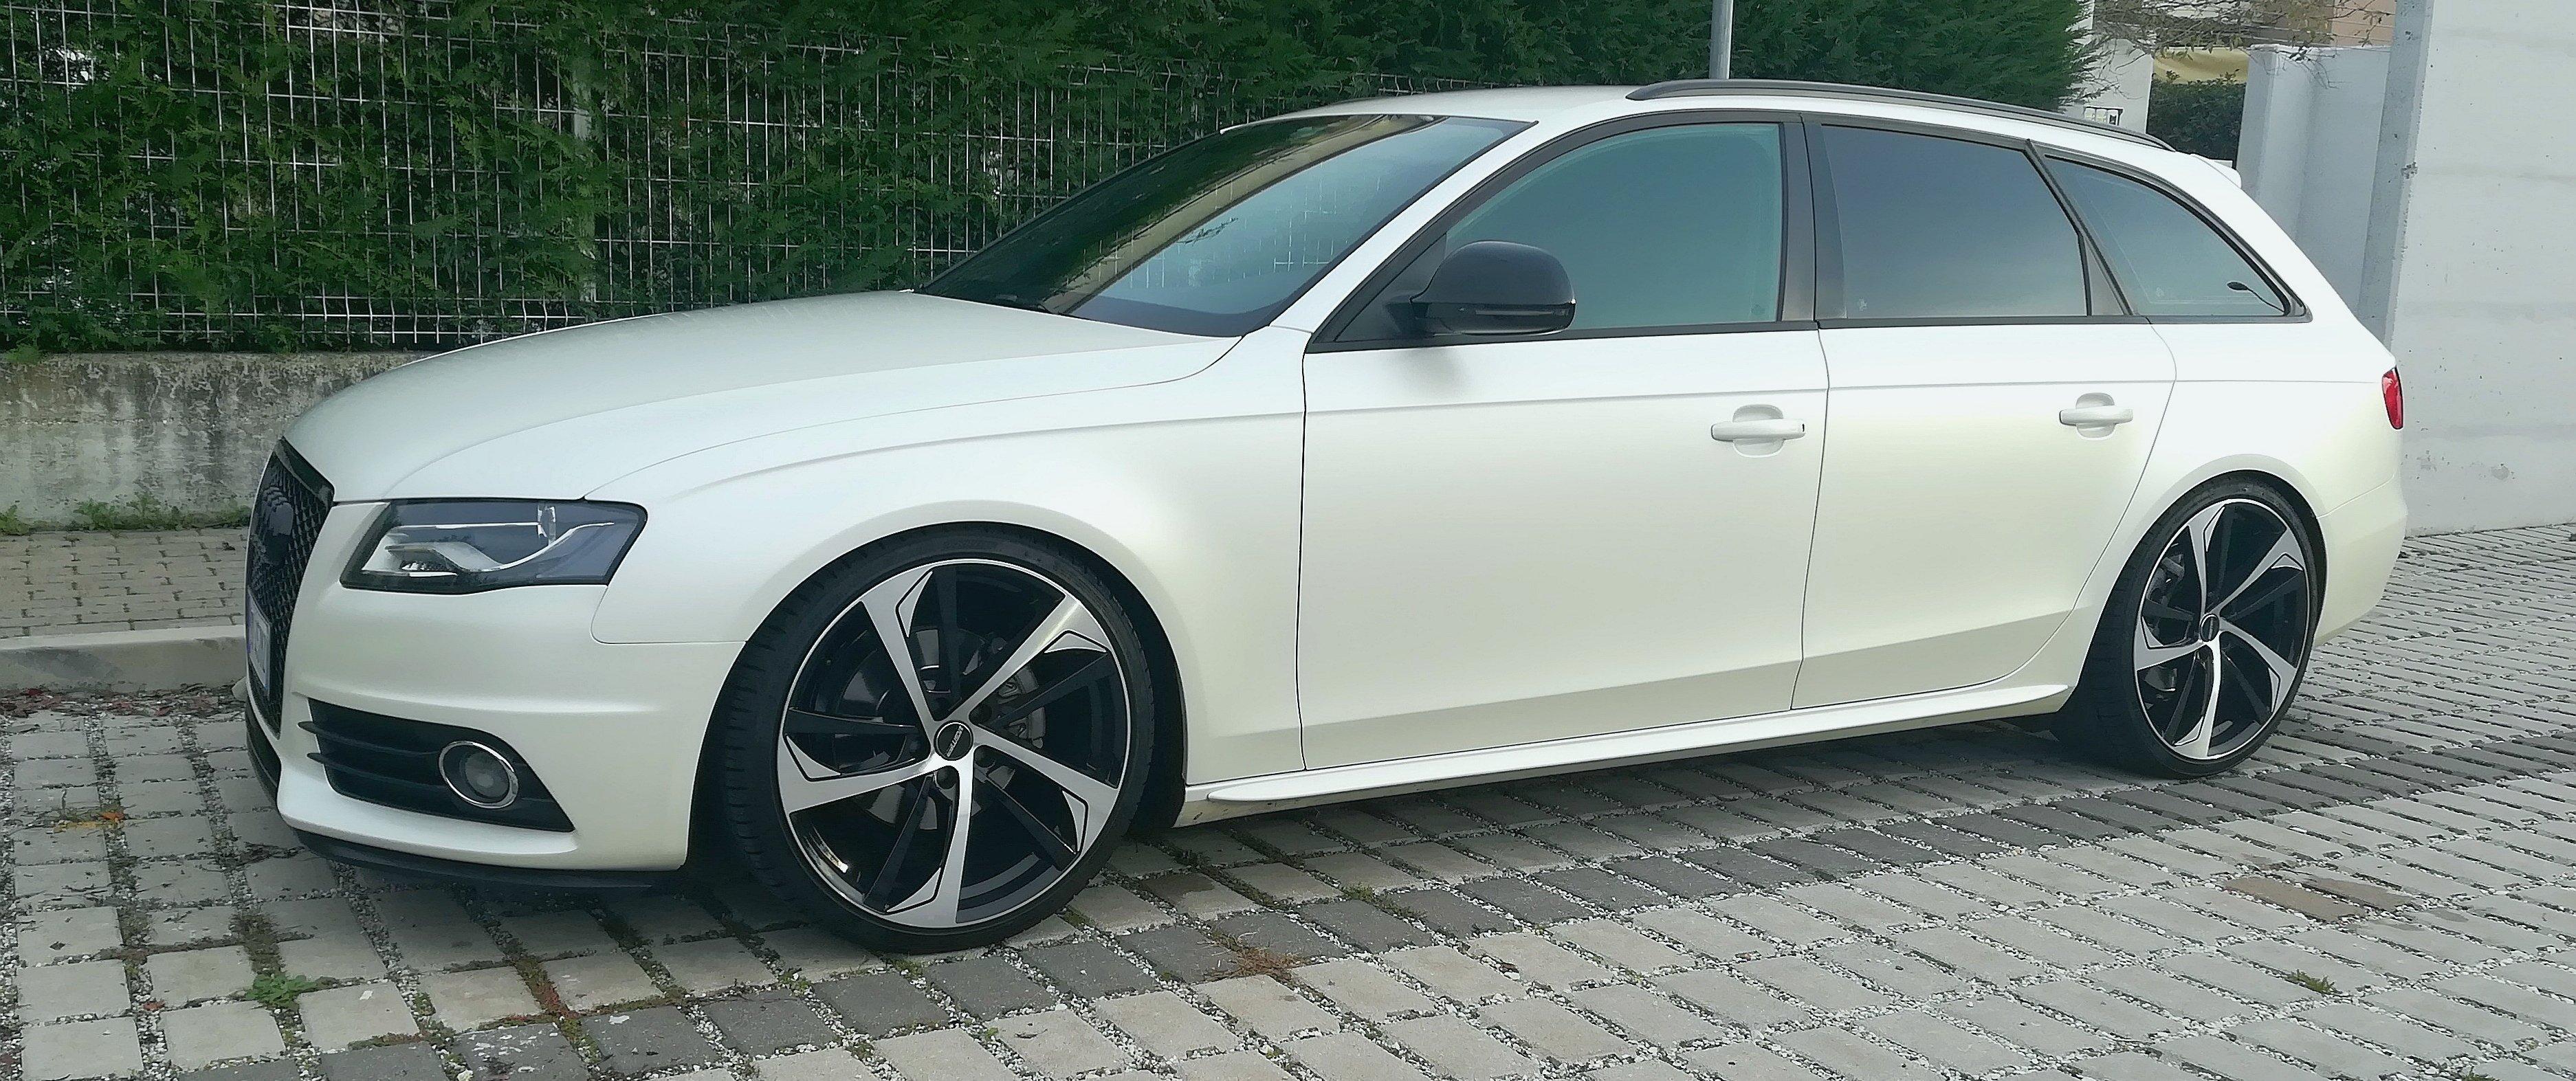 Audi – A4 – GMP ITALIA – Katana – Silber-Schwarz – 20 Zoll